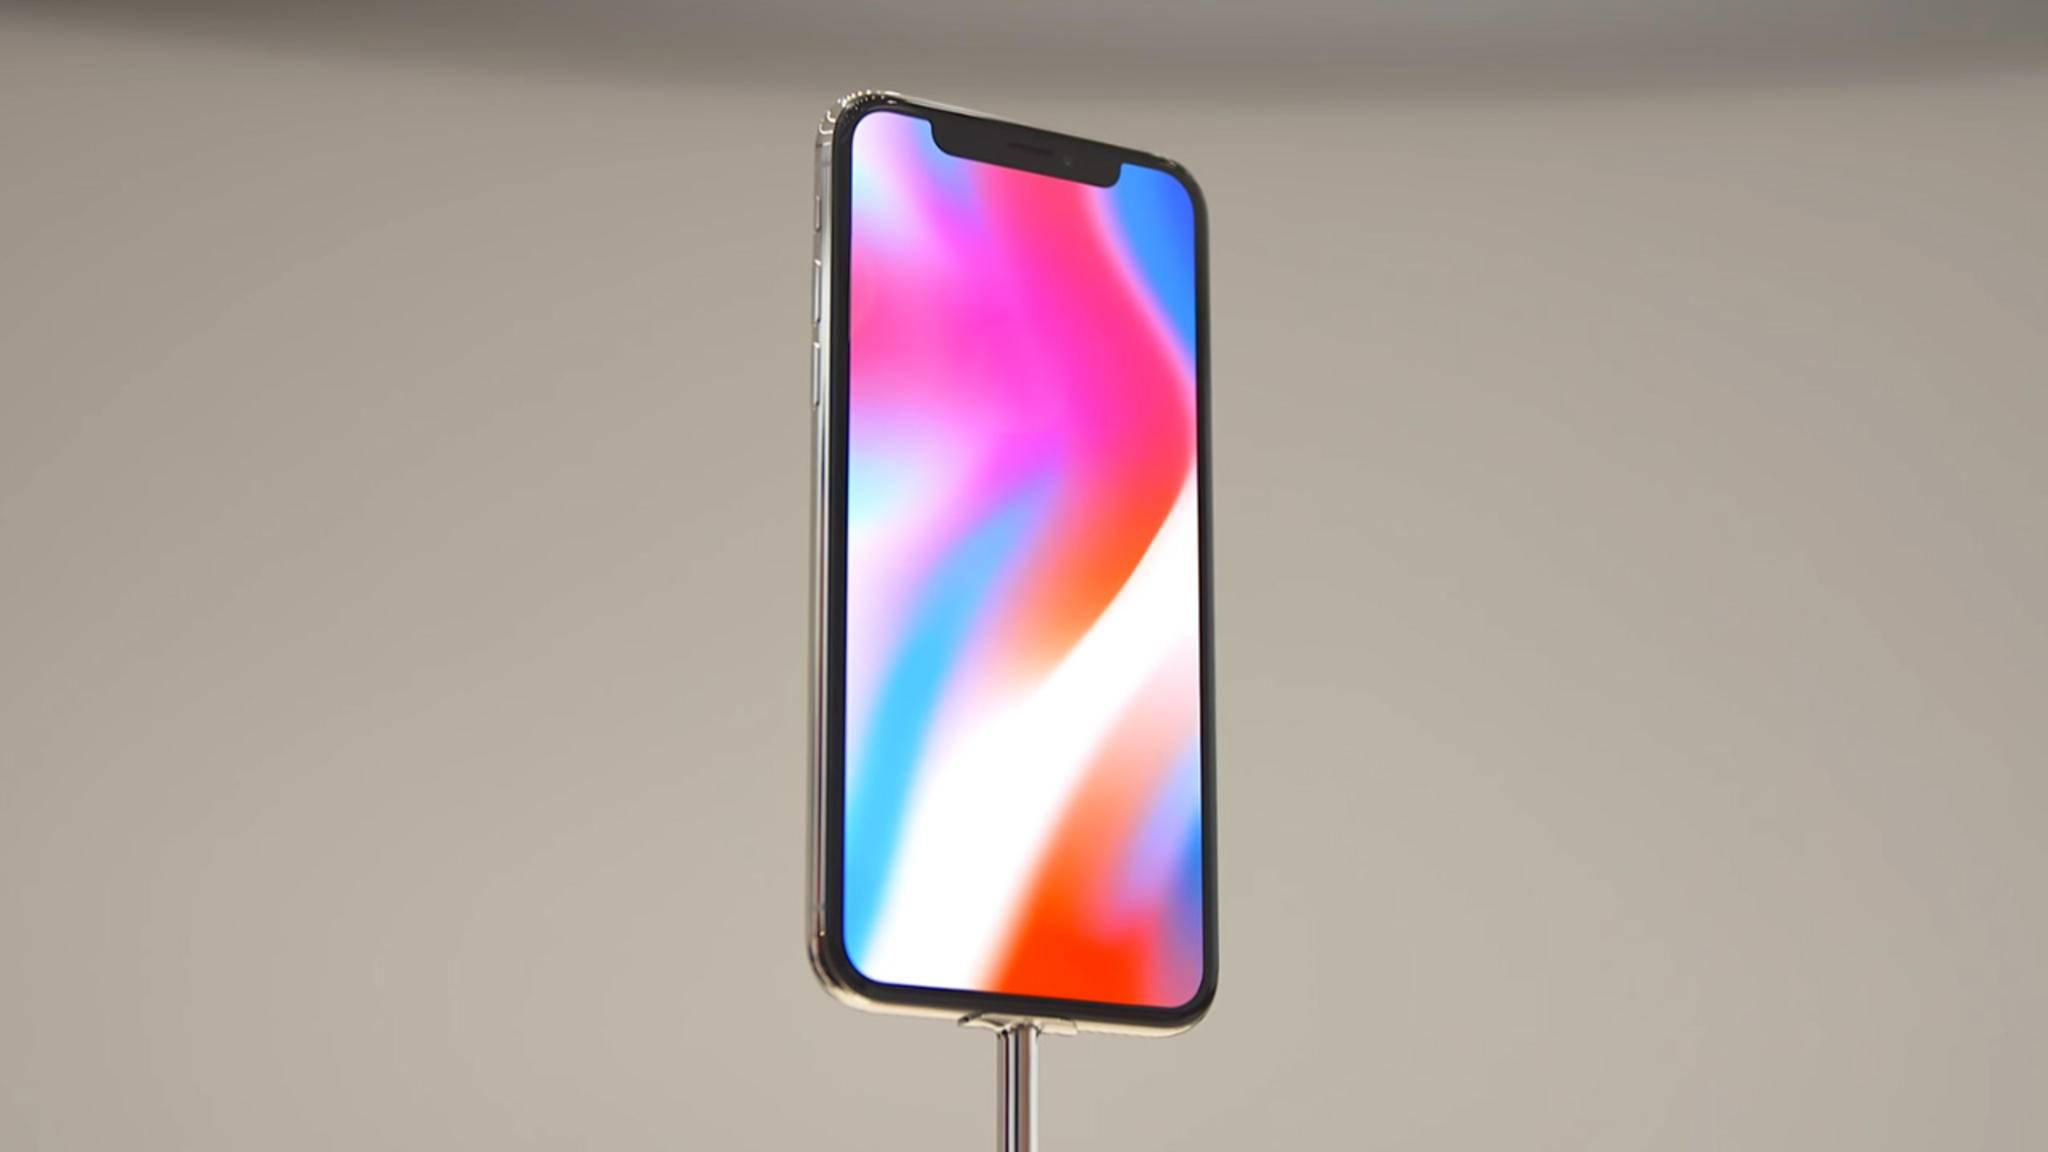 Die Display-Kerbe im iPhone X ist umstritten.